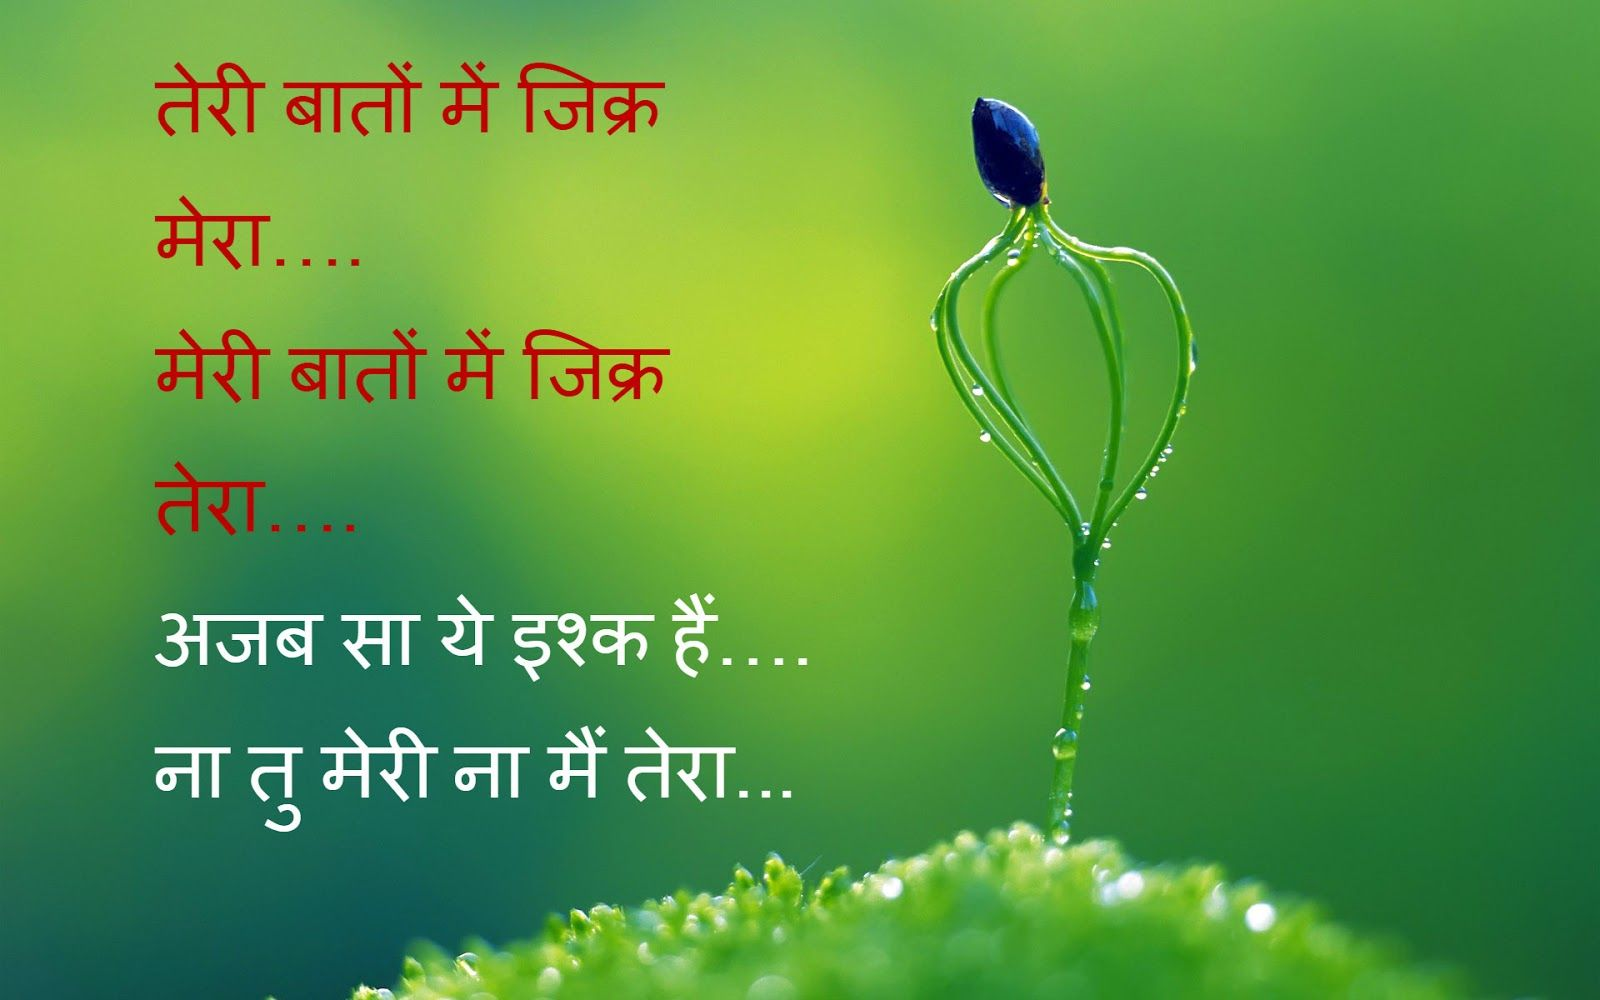 Hindi ShayariLove Shayari ImagesSad Wallpapershappy New